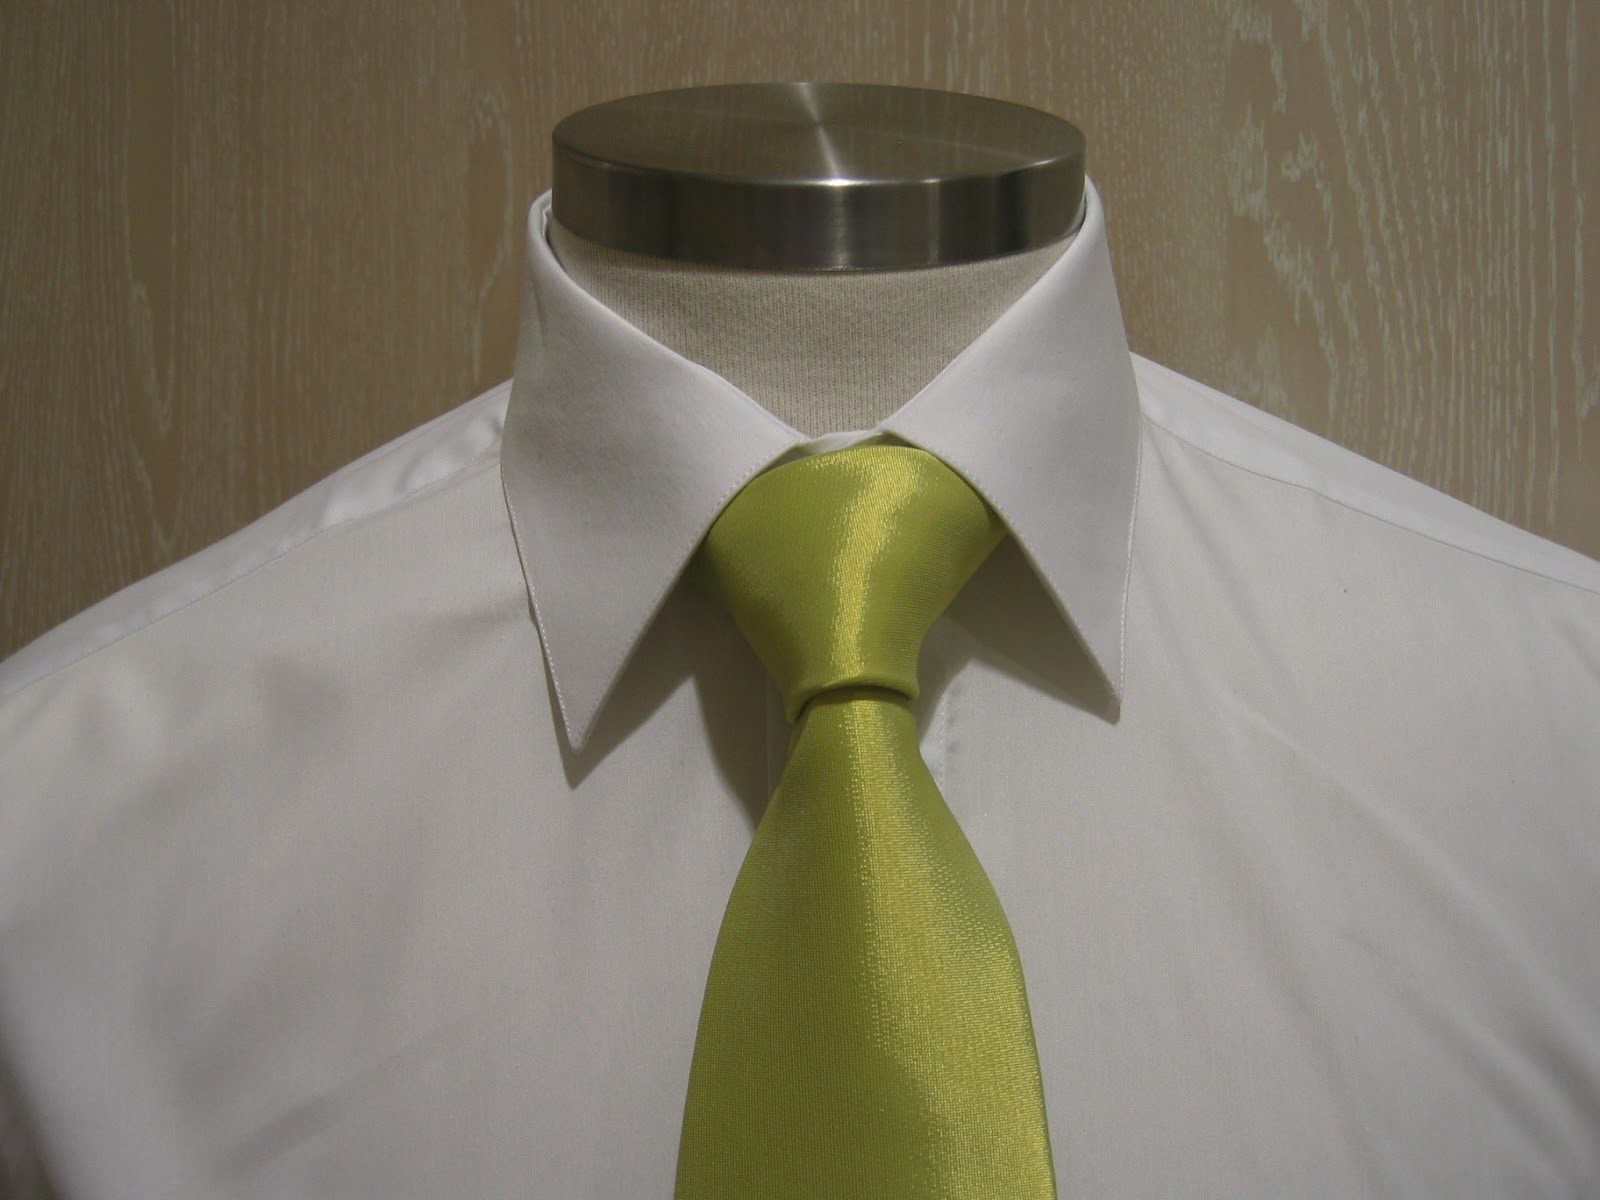 Como hacer nudo de corbata windsor perfecto paso a paso for Nudo de corbata windsor